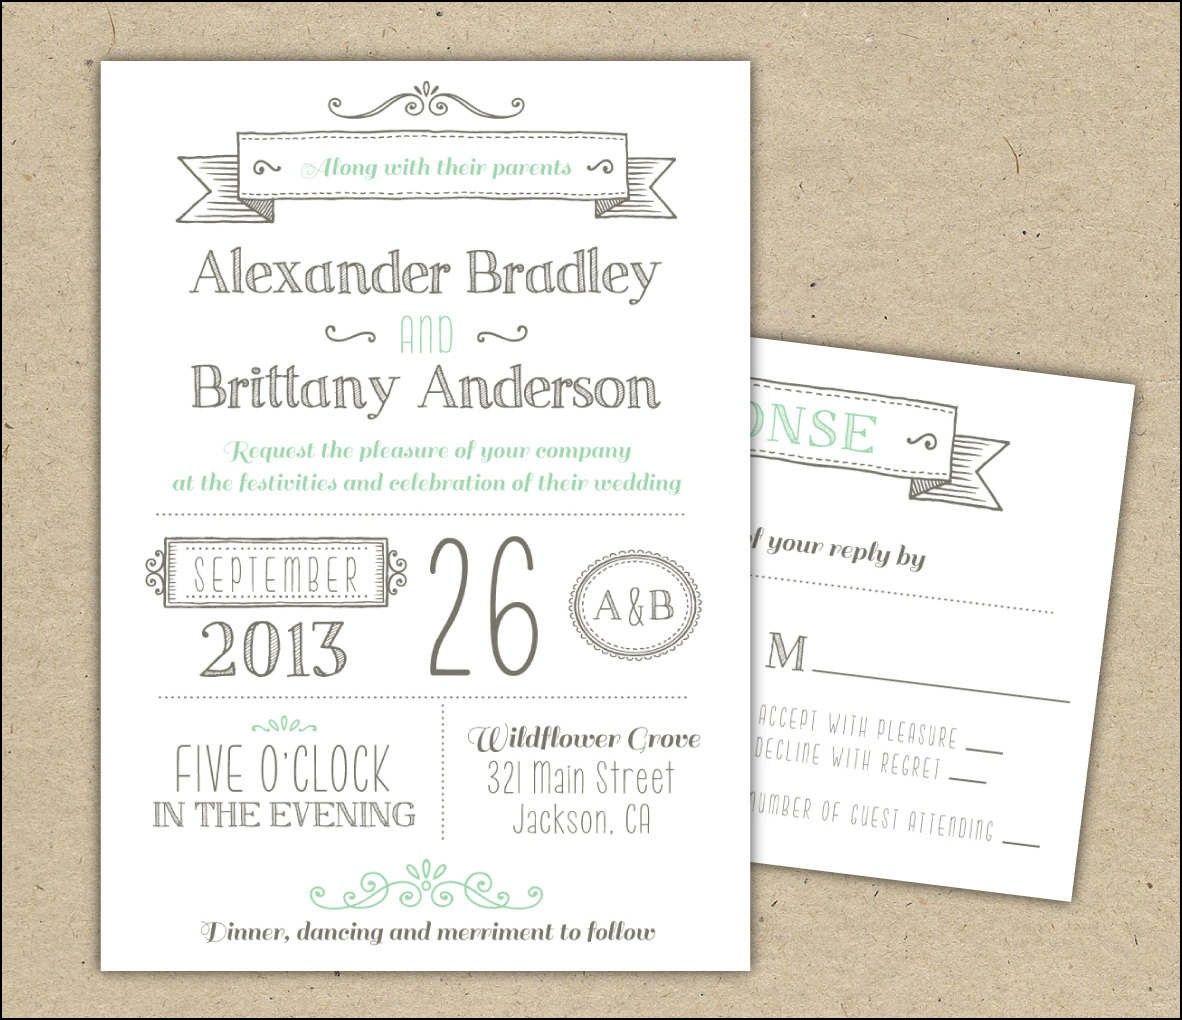 Downloadable Wedding Invites | Wedding Ideas | Pinterest | Wedding ...